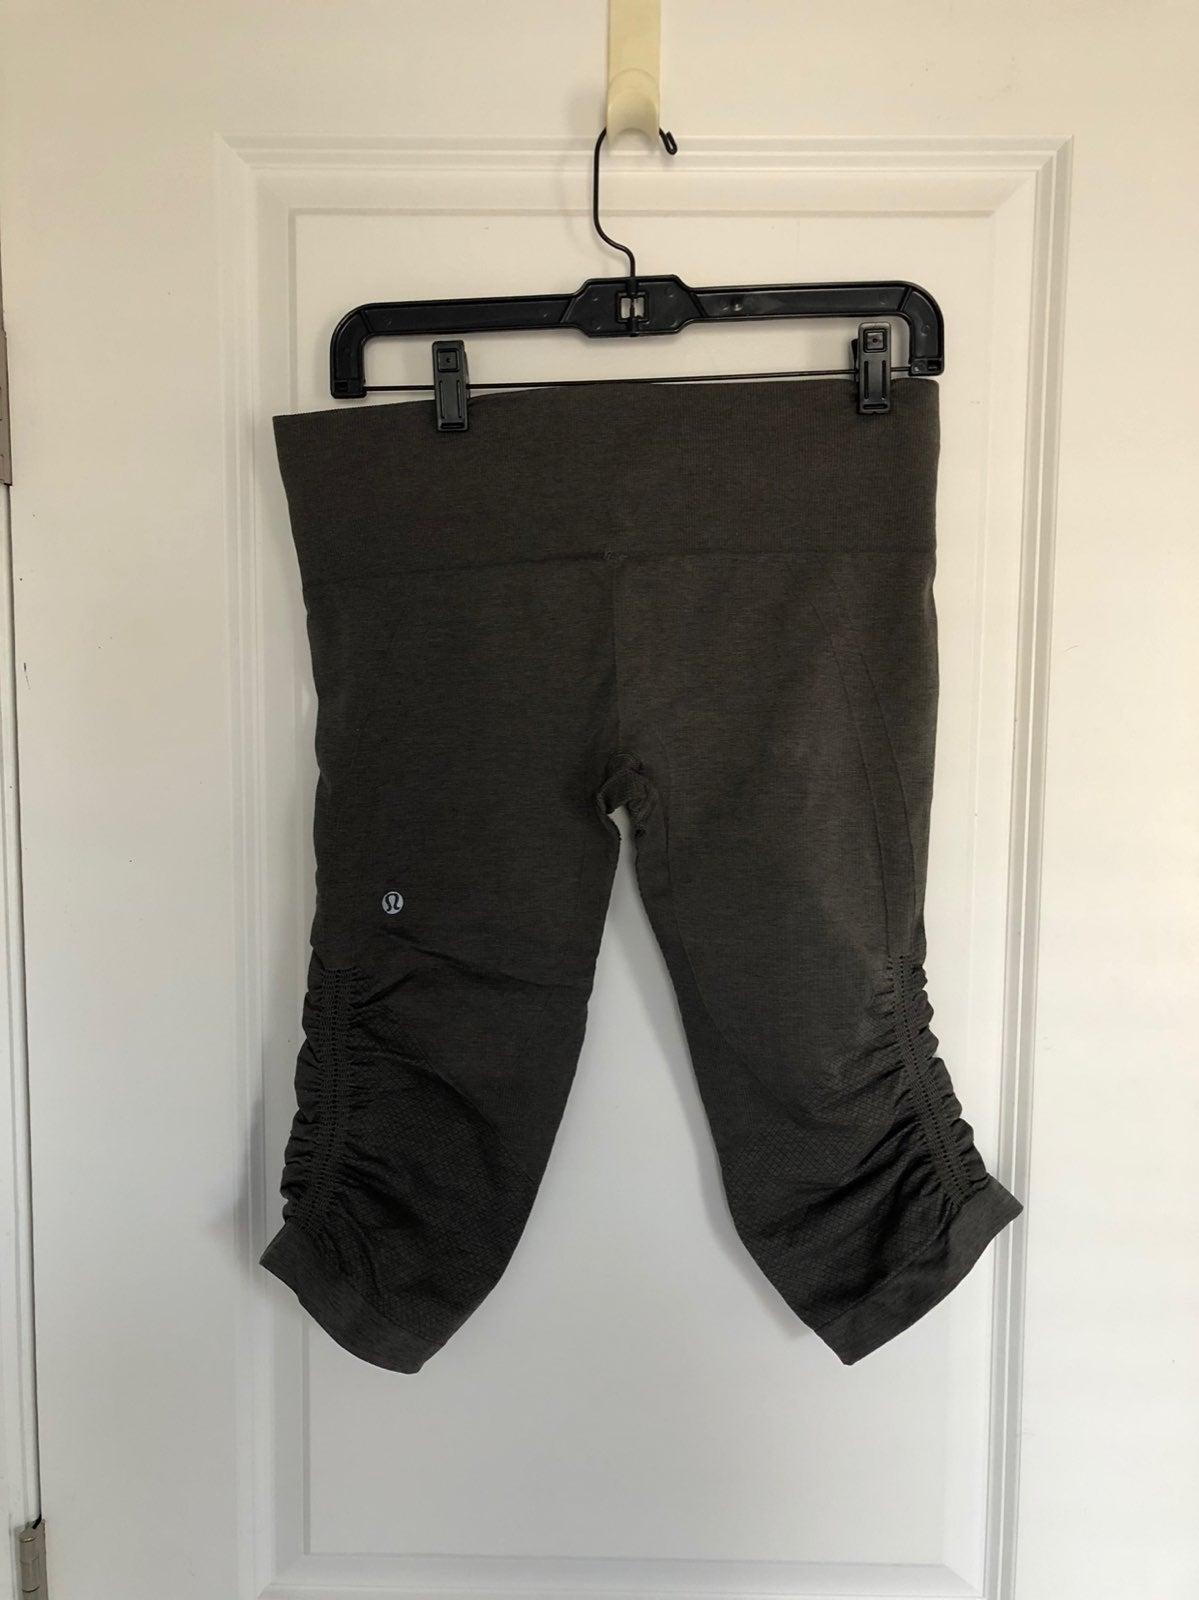 Lululemon Ebb to Street Capri Pants sz 8